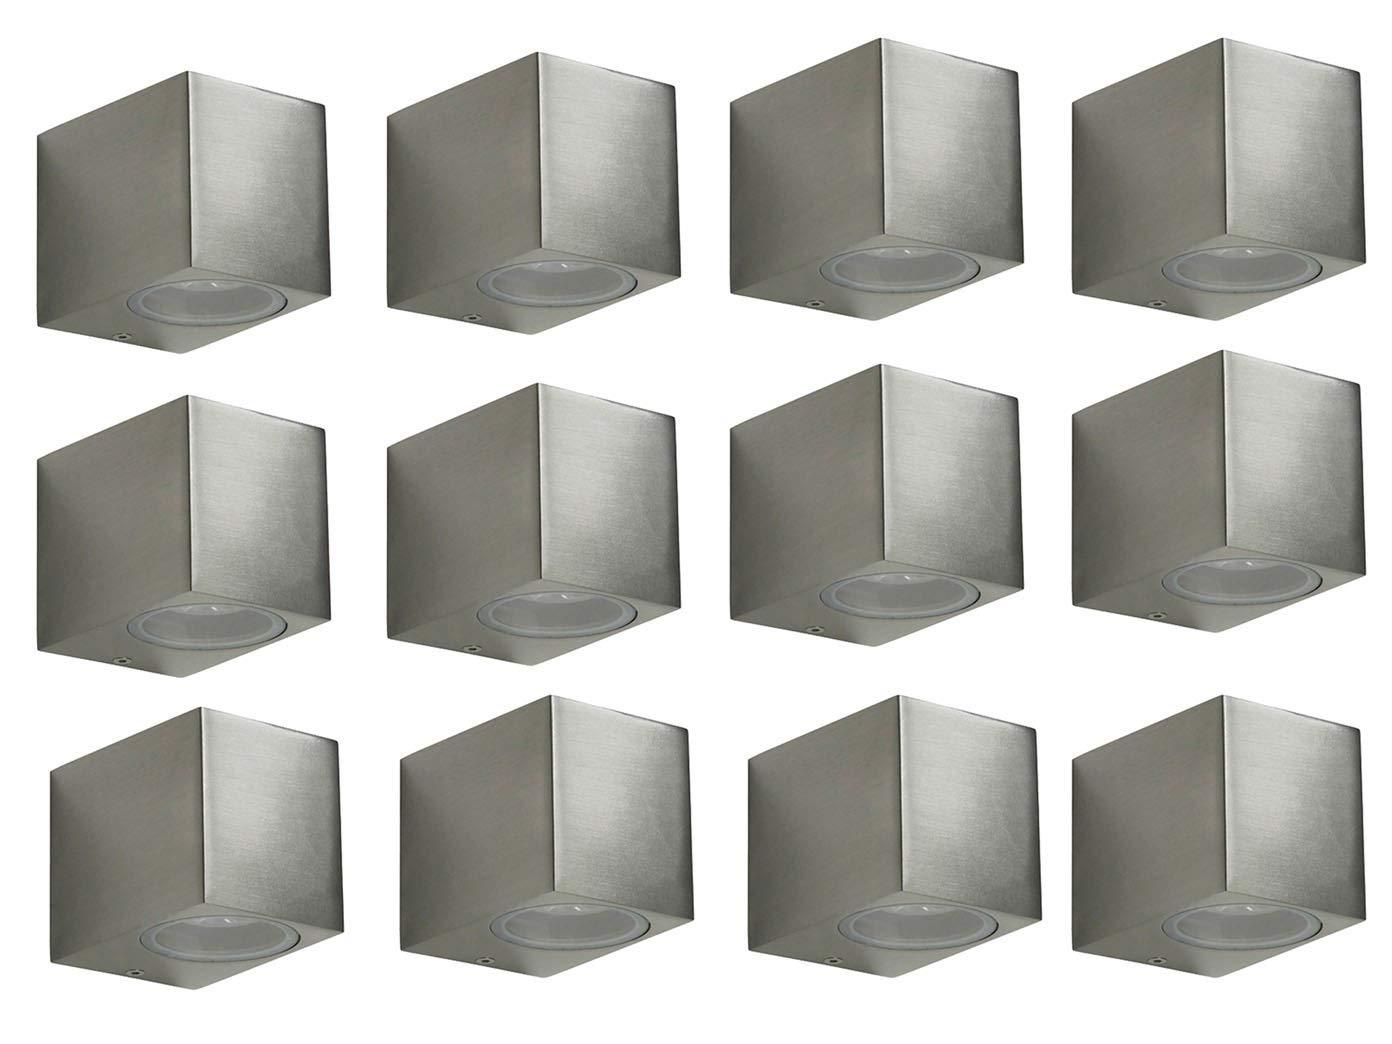 Set of 12Mika Ranex XQ1272SMD LED Wall Light–Cube Downlight, 160LM, WARM, IP44, 5000.46412